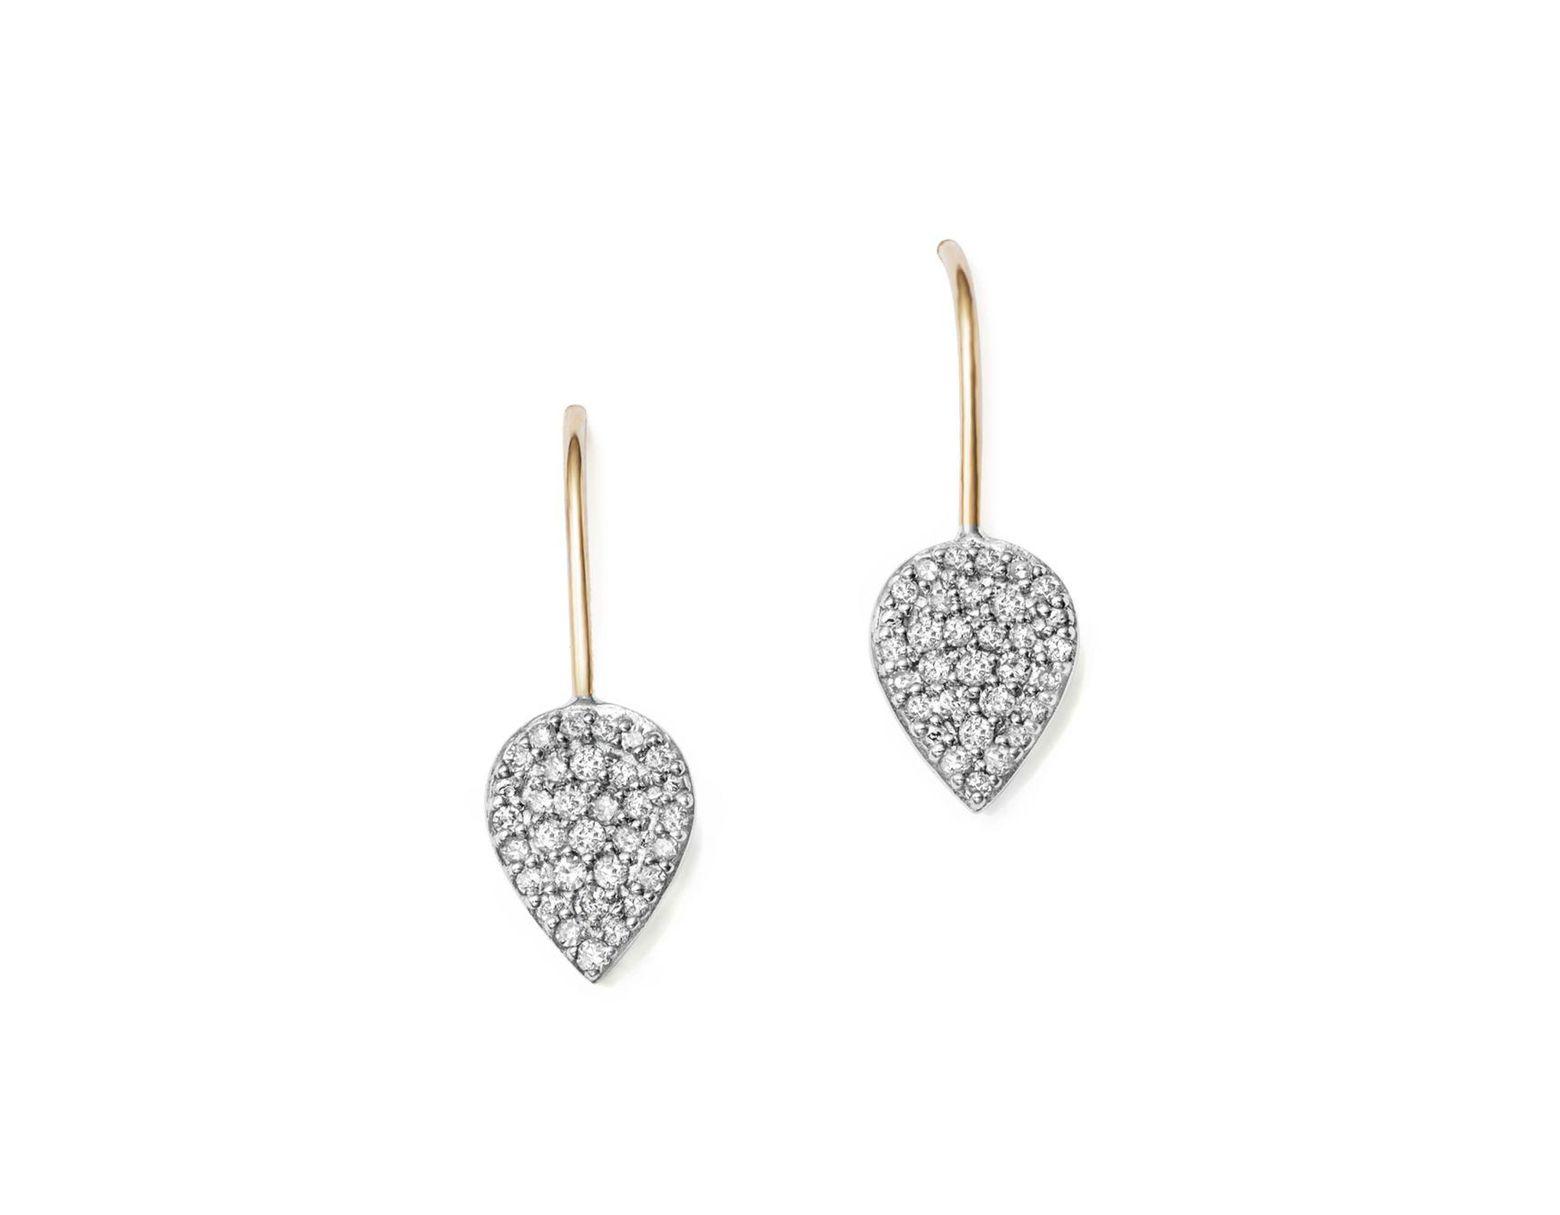 2a278526d Adina Reyter Sterling Silver And 14k Yellow Gold Pavé Diamond Teardrop  Earrings in Metallic - Lyst